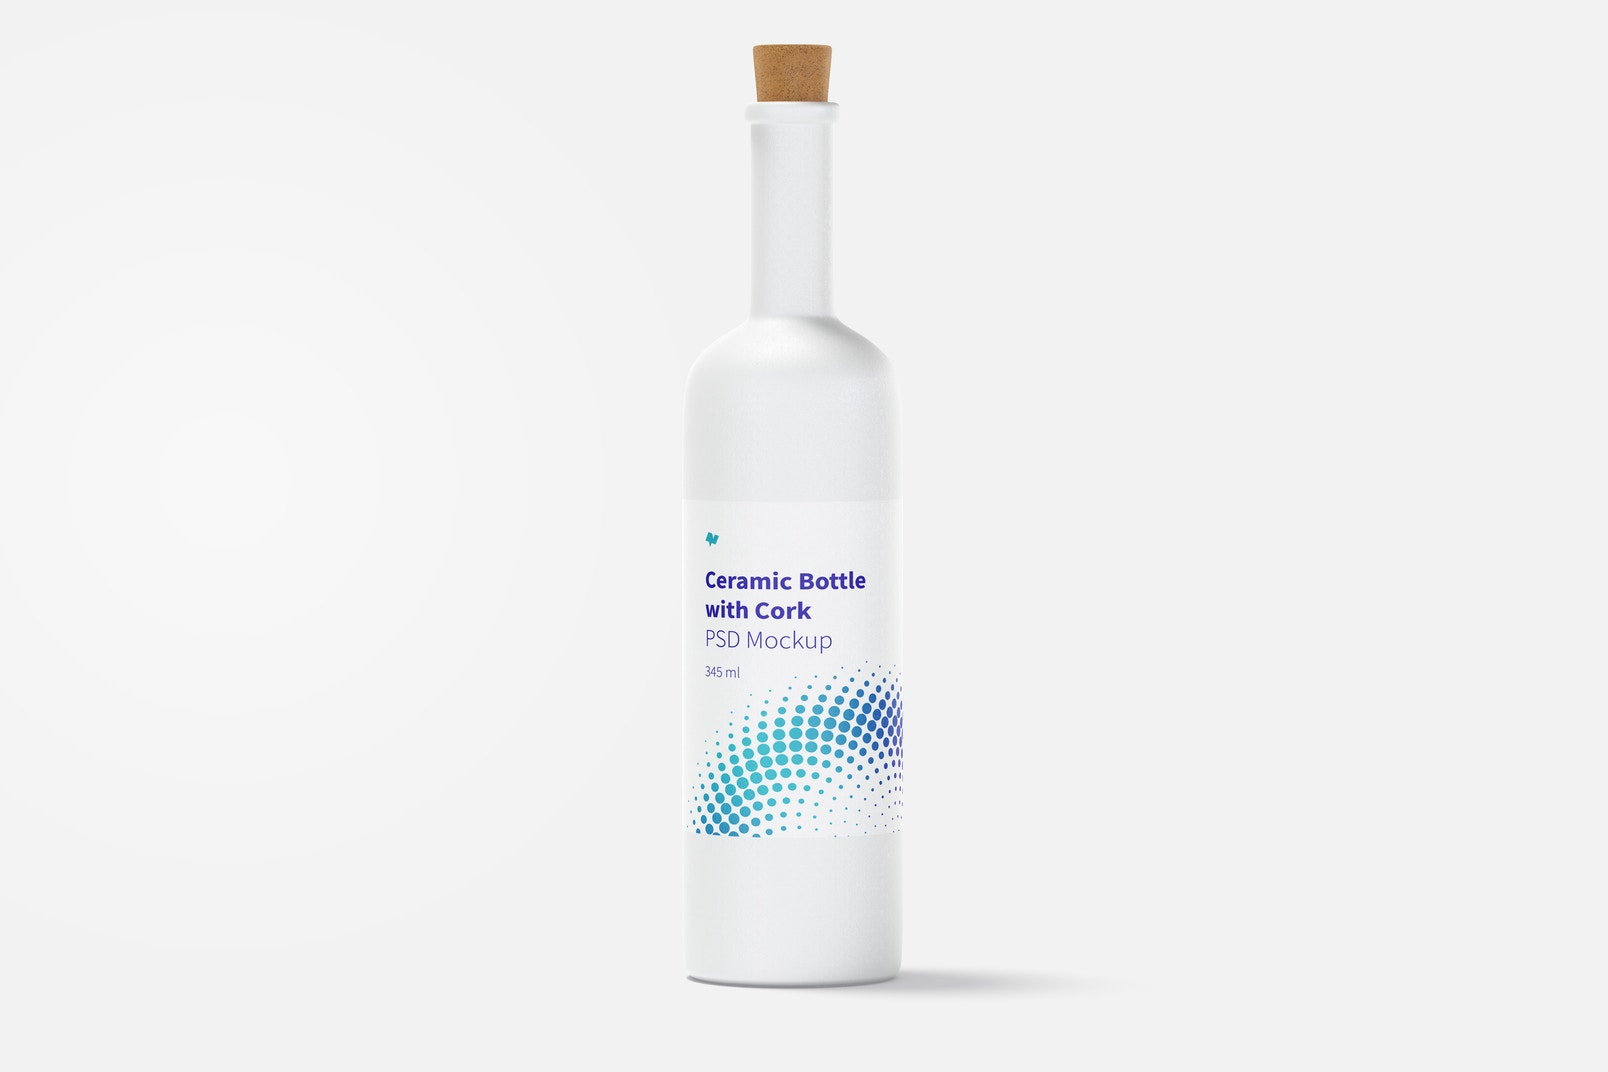 Long Neck Ceramic Bottle with Cork Mockup